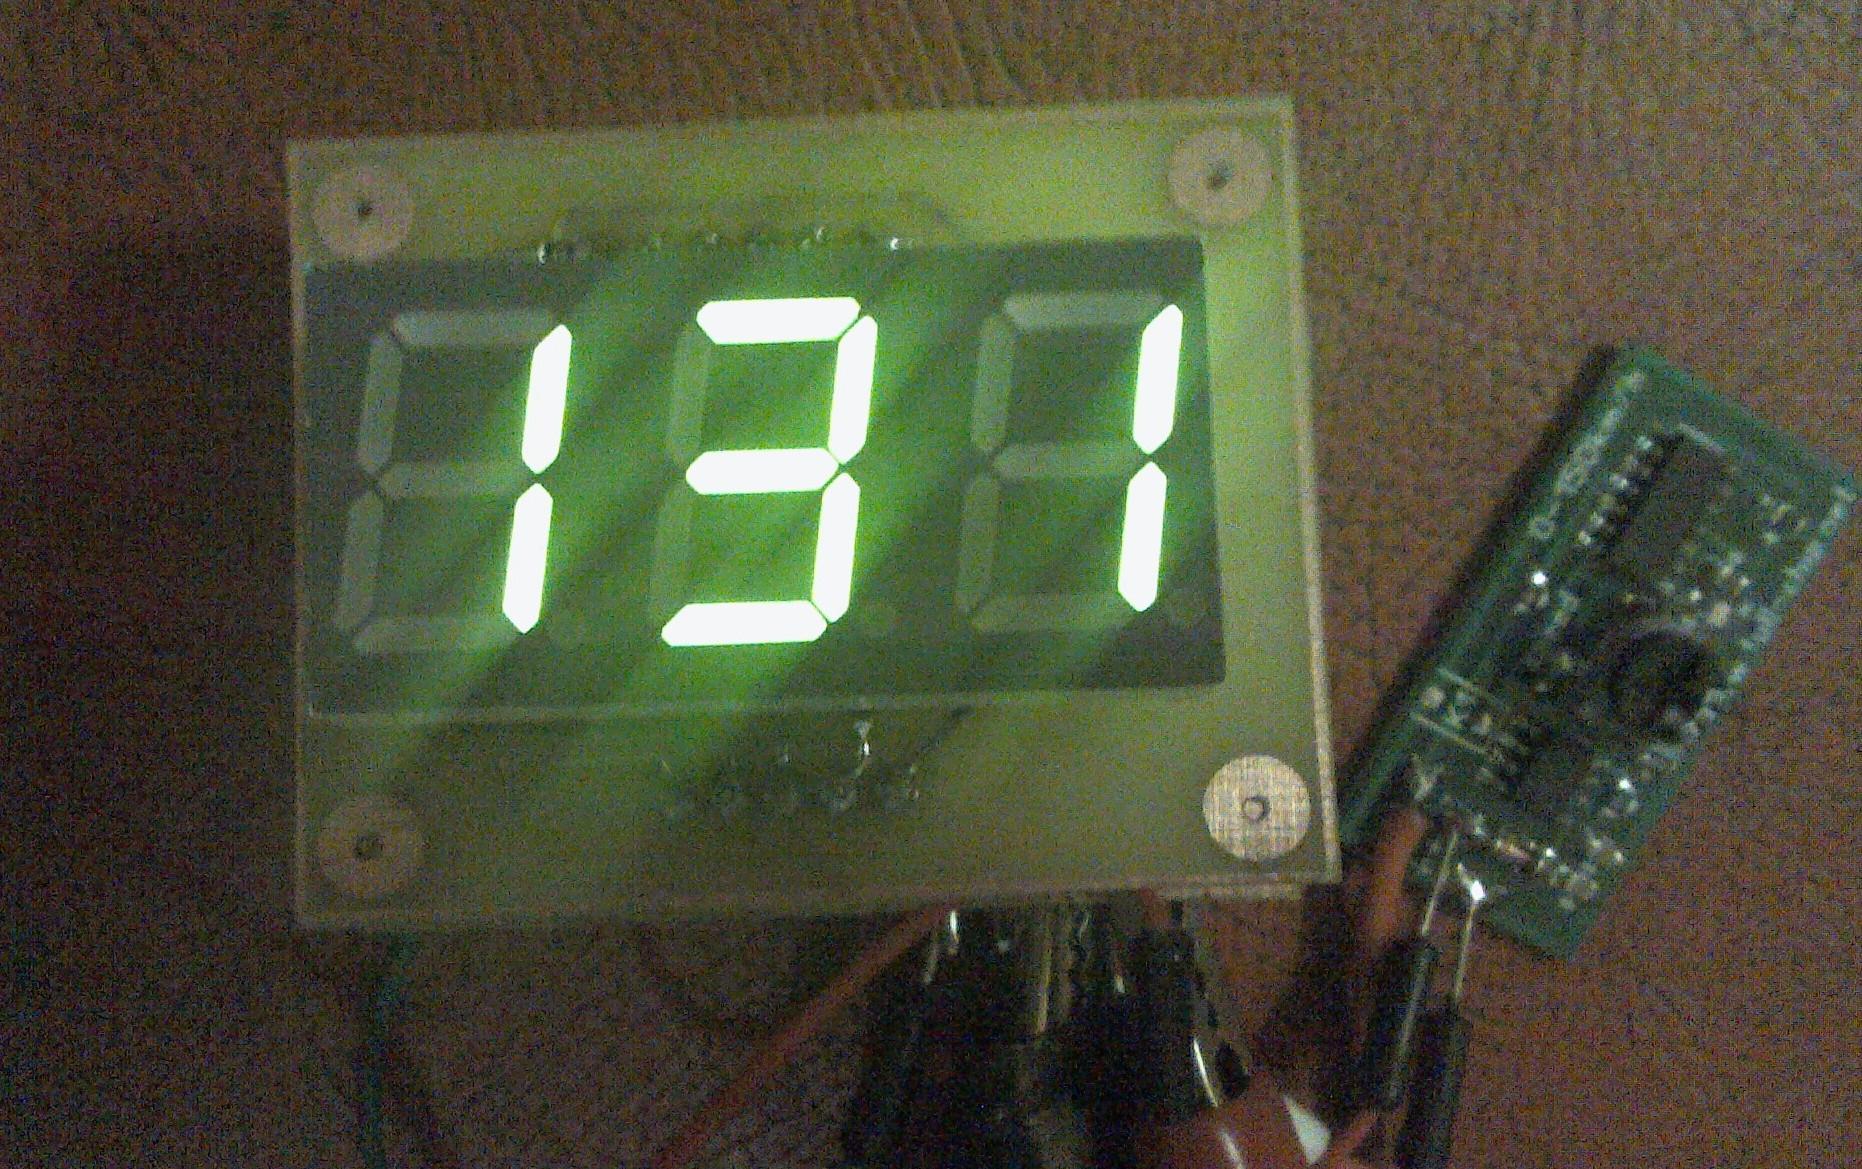 електрический спидометр.схема